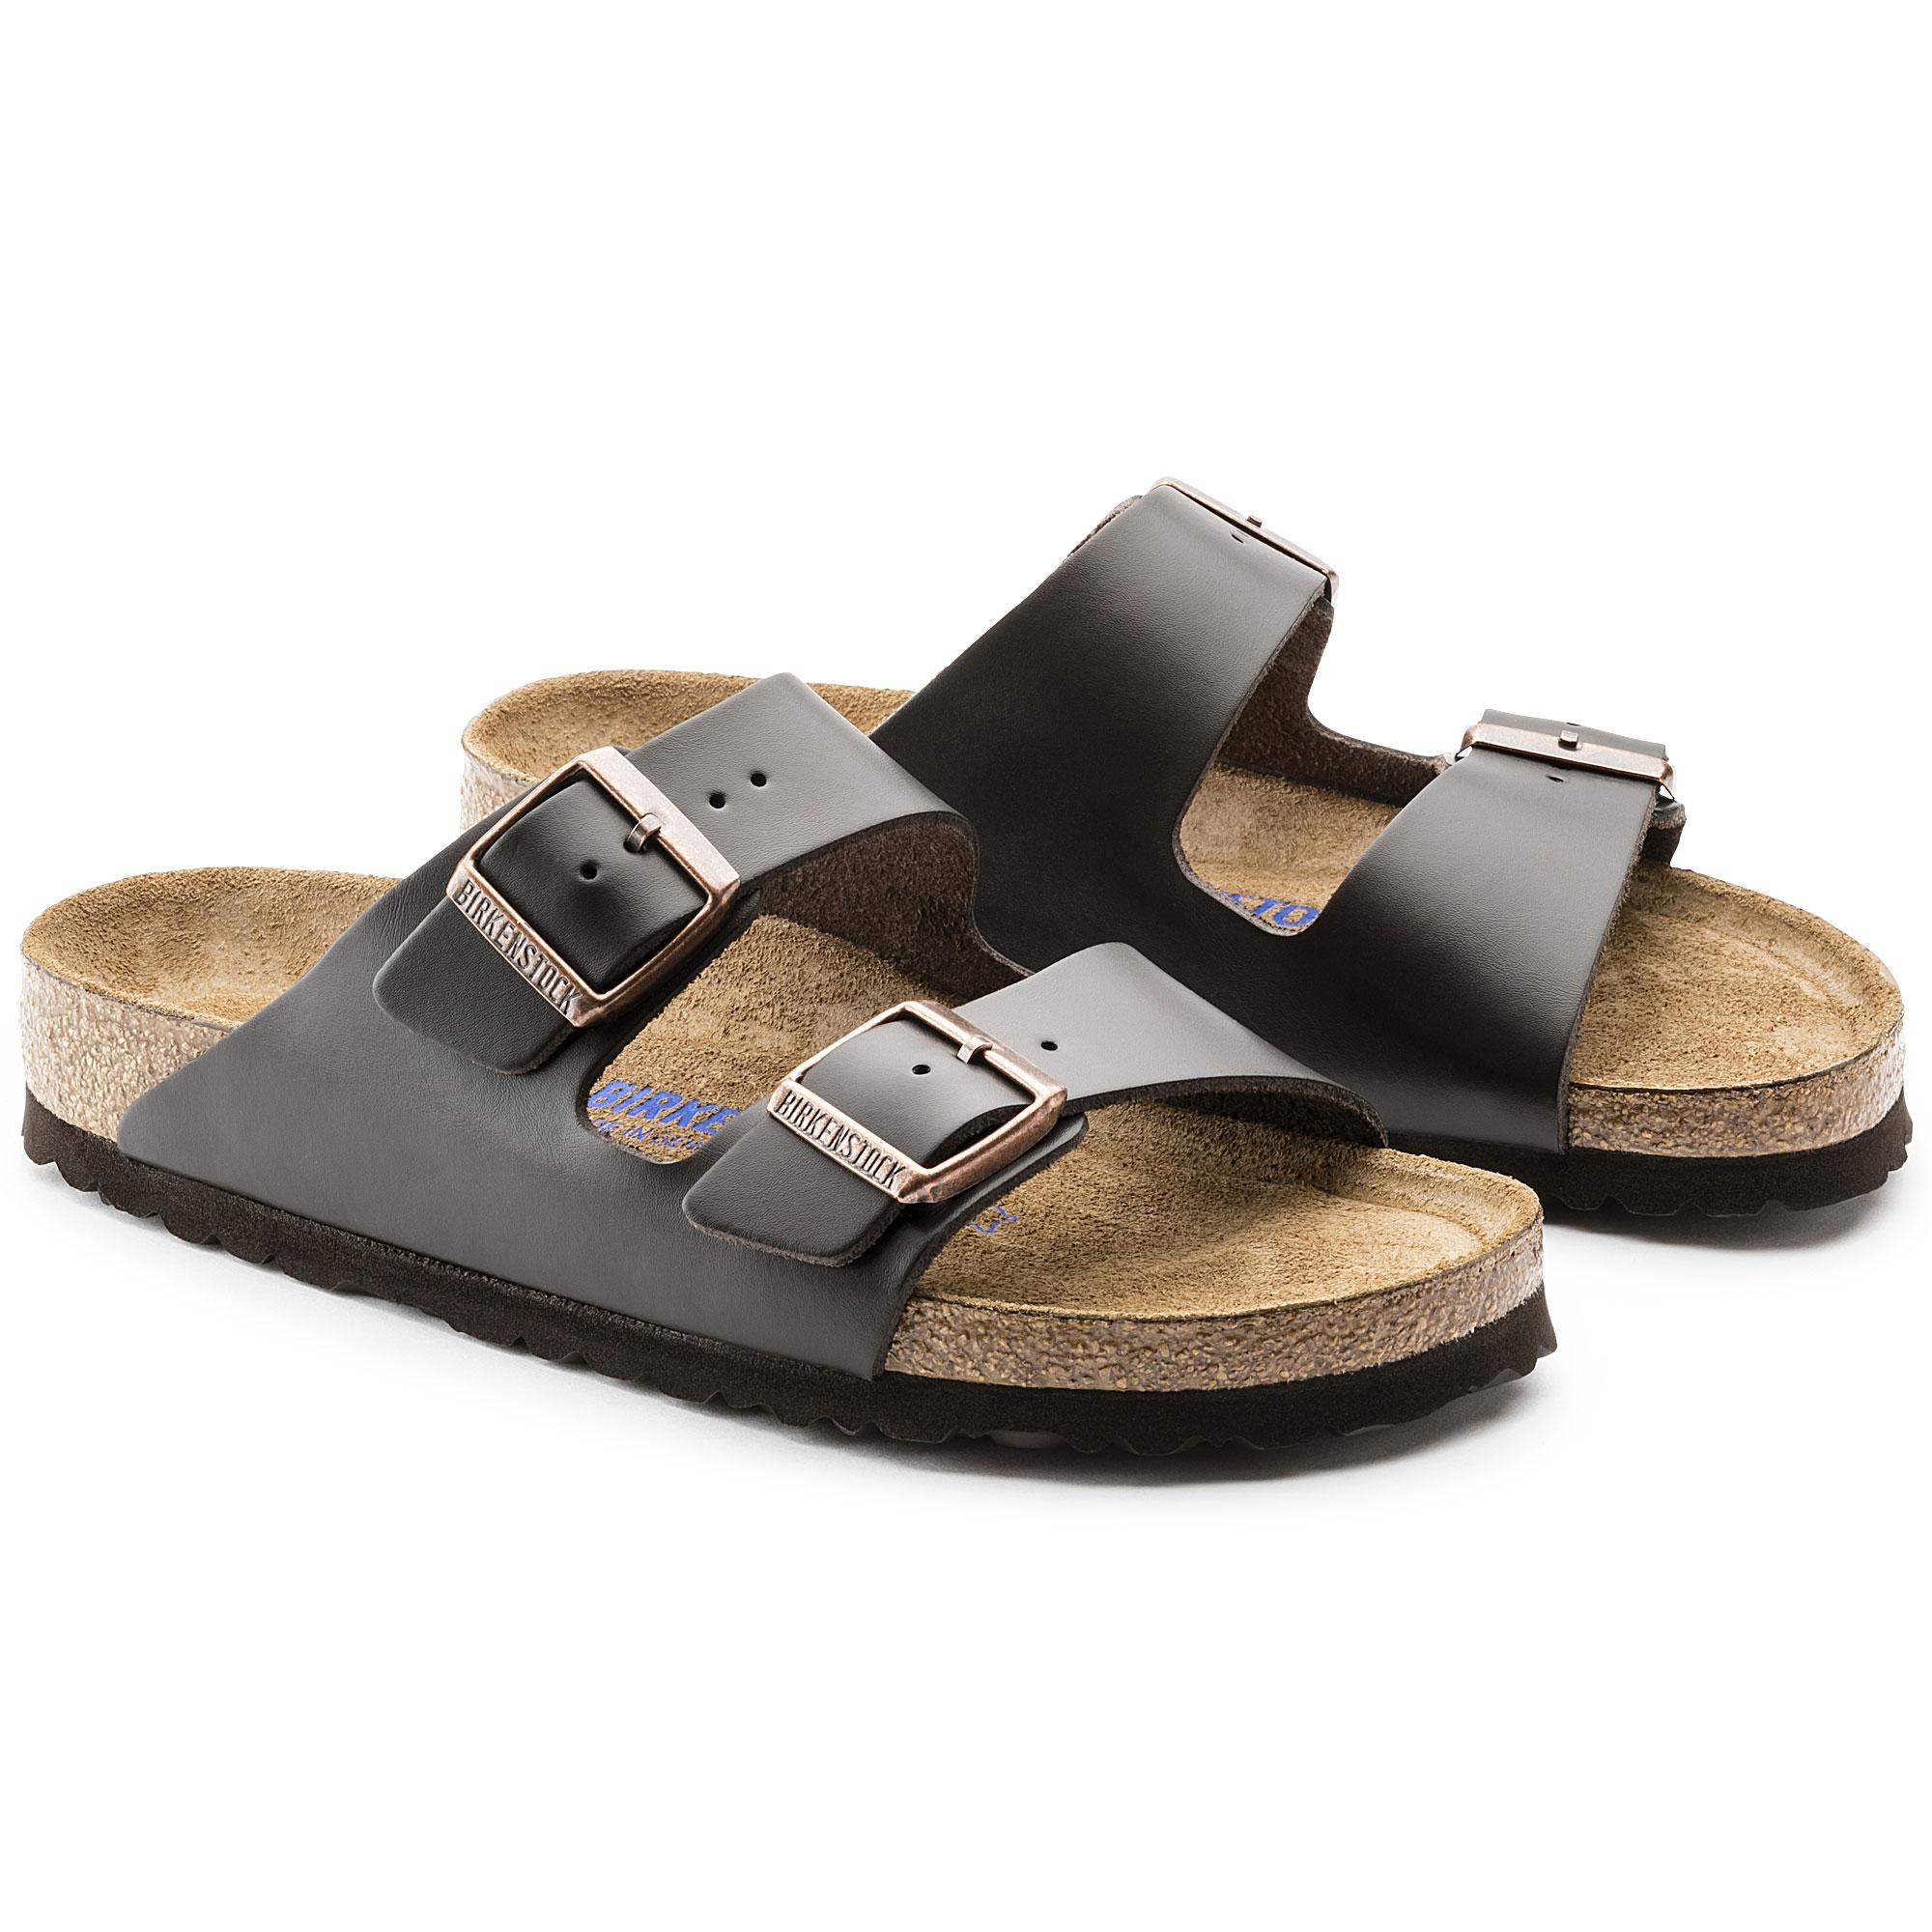 Birkenstock Arizona Smooth Leather Soft Footbed Womens Sandals i4fgGAPpv